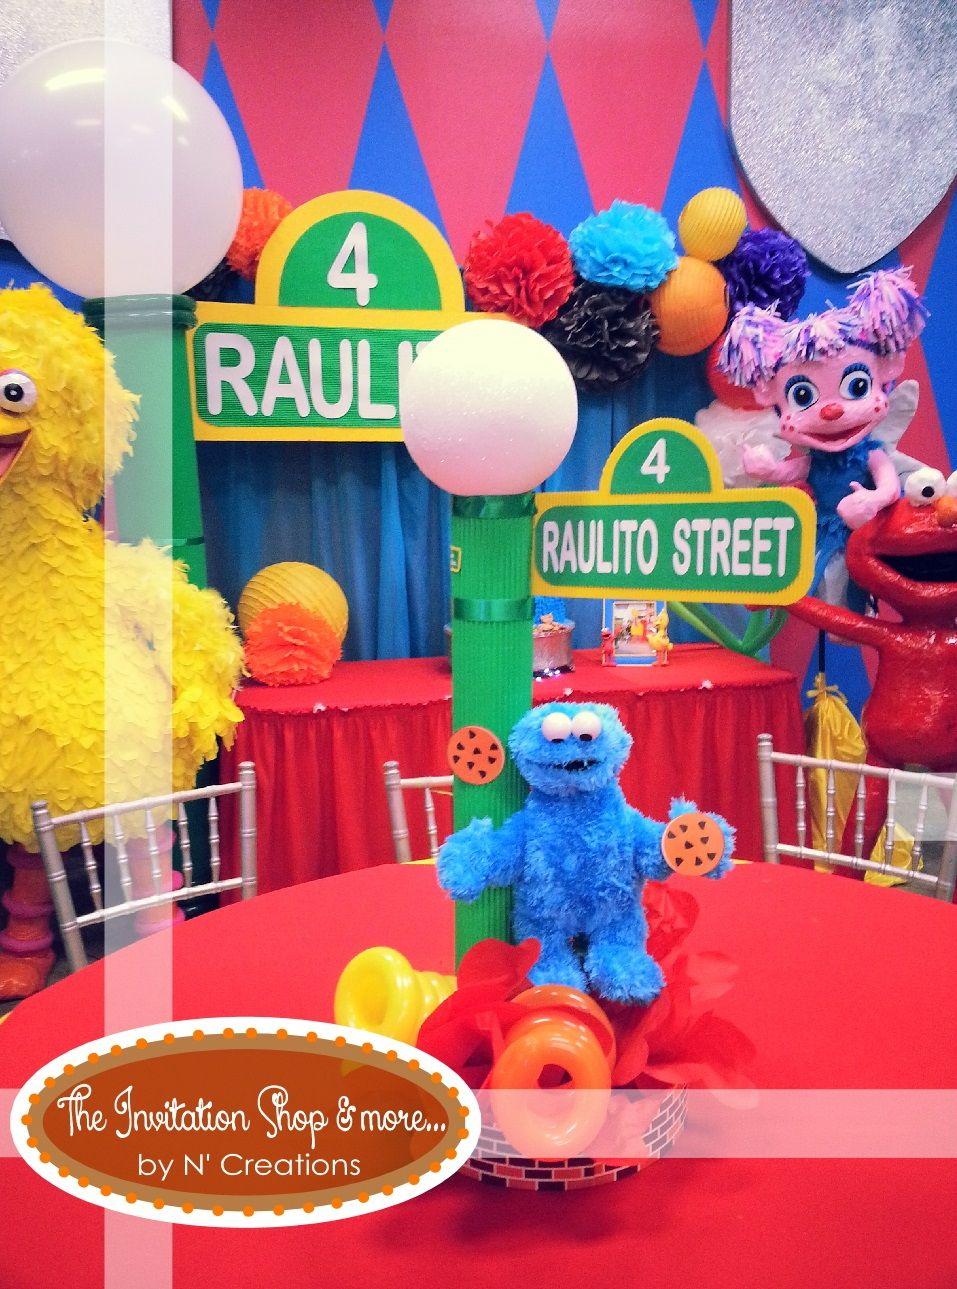 Stupendous Adorable Sesame Street Centerpieces Sesame Street Birthday Interior Design Ideas Tzicisoteloinfo